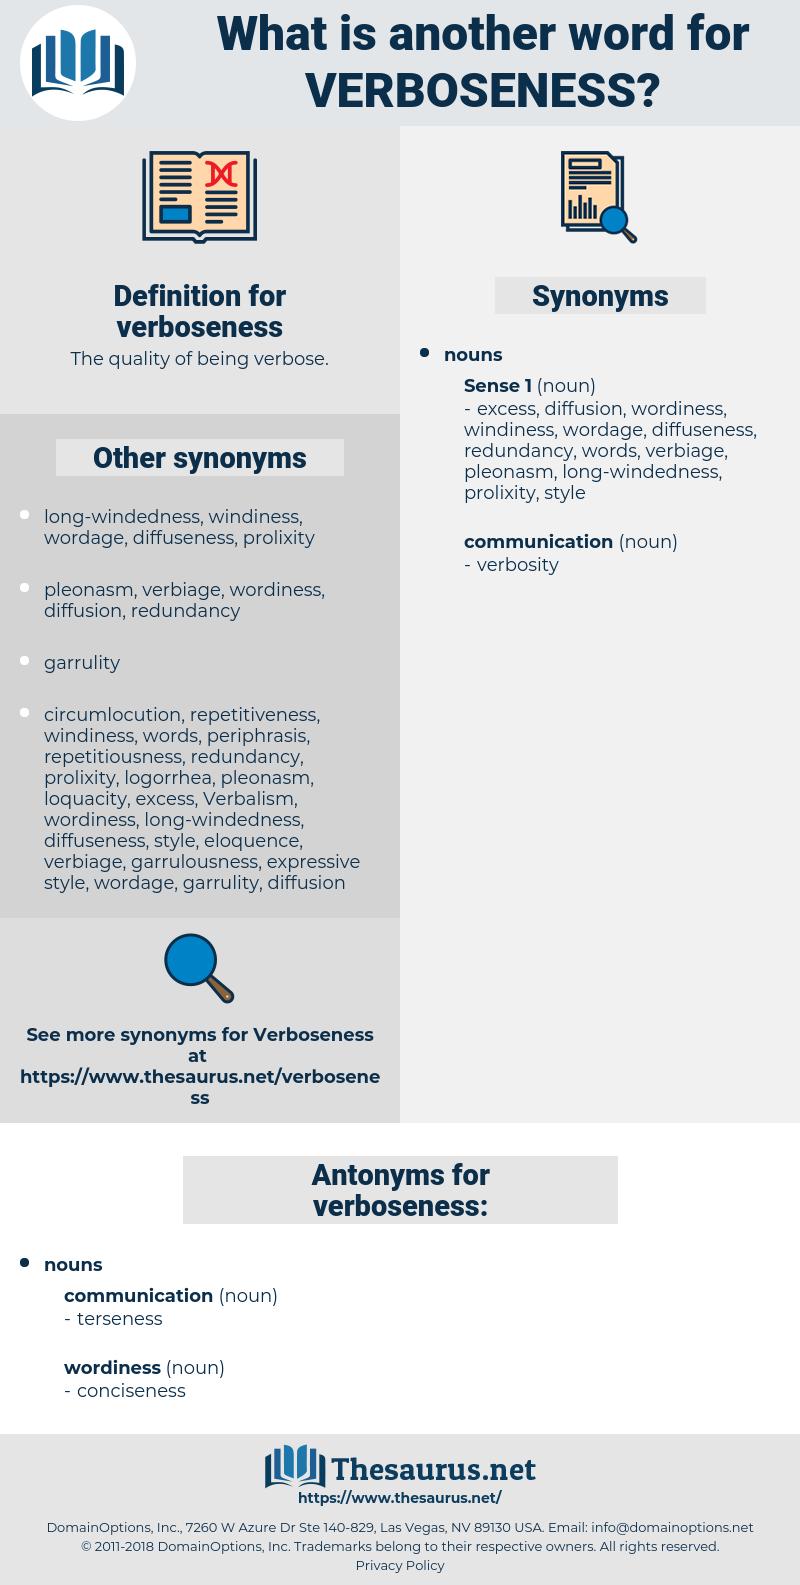 verboseness, synonym verboseness, another word for verboseness, words like verboseness, thesaurus verboseness